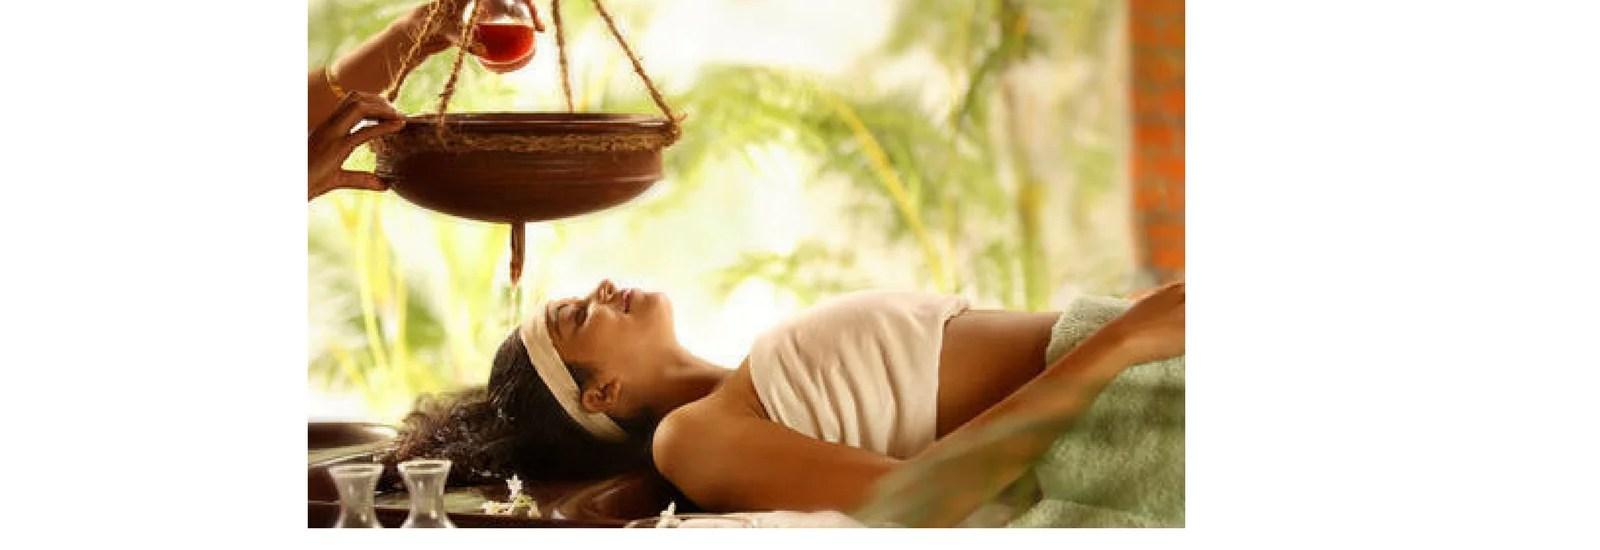 Ayurvedic Oil Bath Benefits for Modern Lifestyles